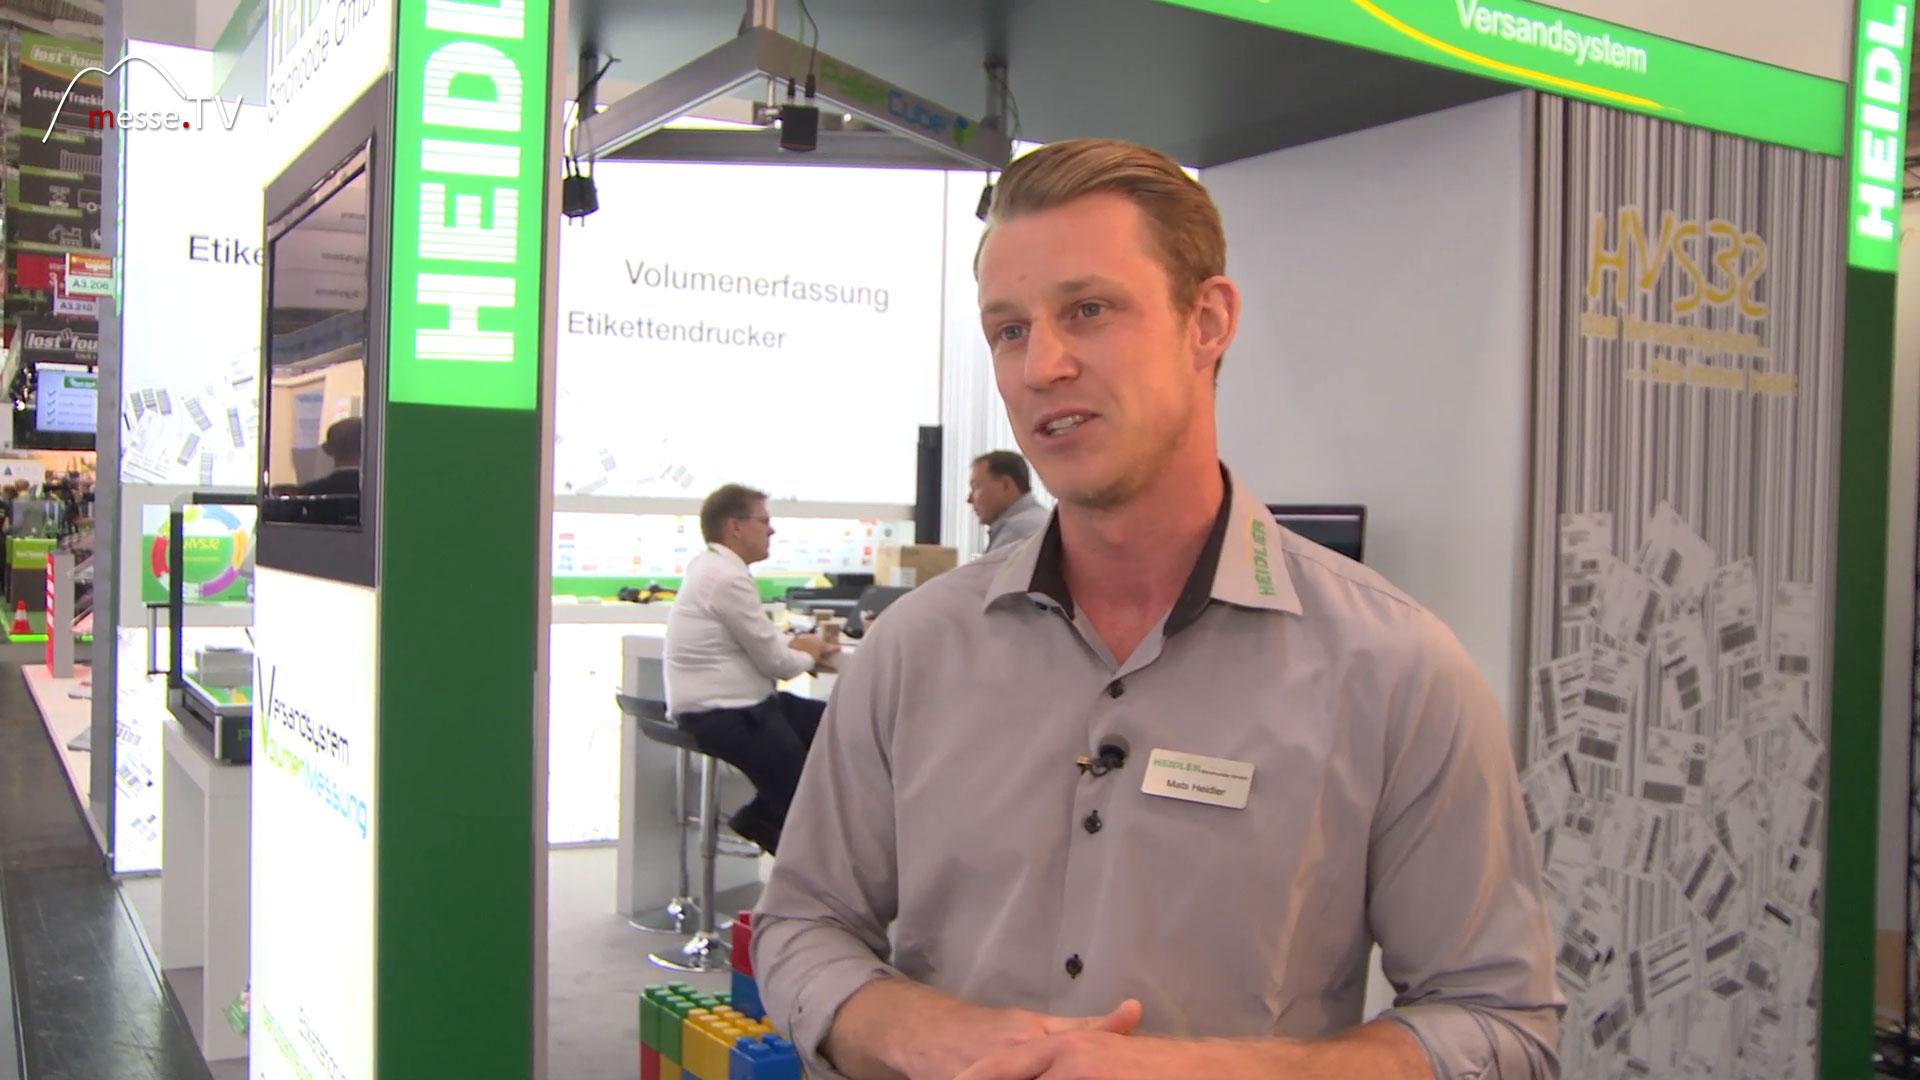 HEIDLER CEO Mats Heidler transport logistic 2019 Messe München